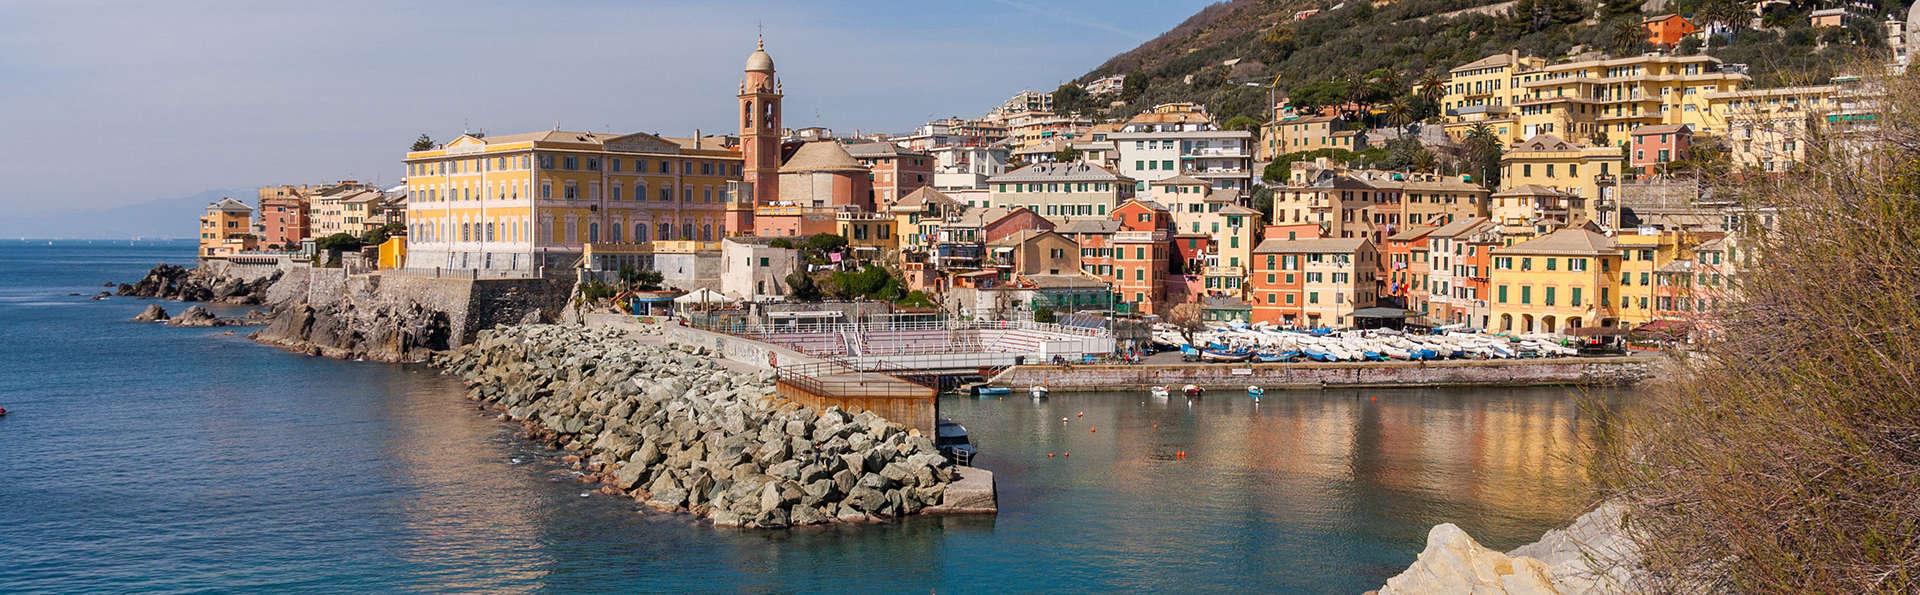 MarinaPlace - Edit_Genova2.jpg